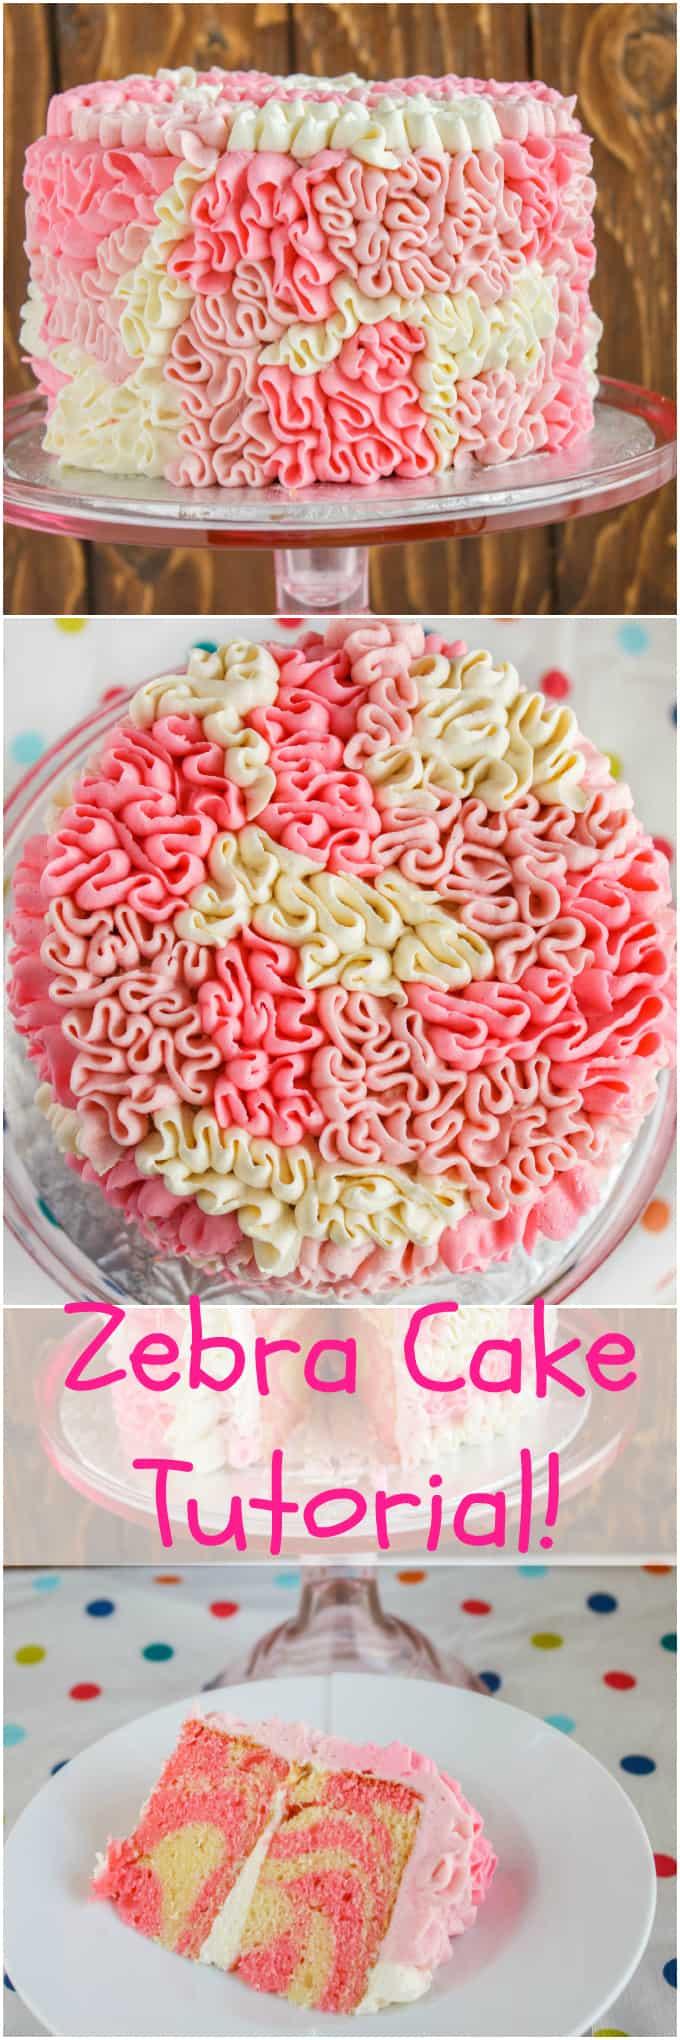 Zebra Cake with Messy Ruffles 8